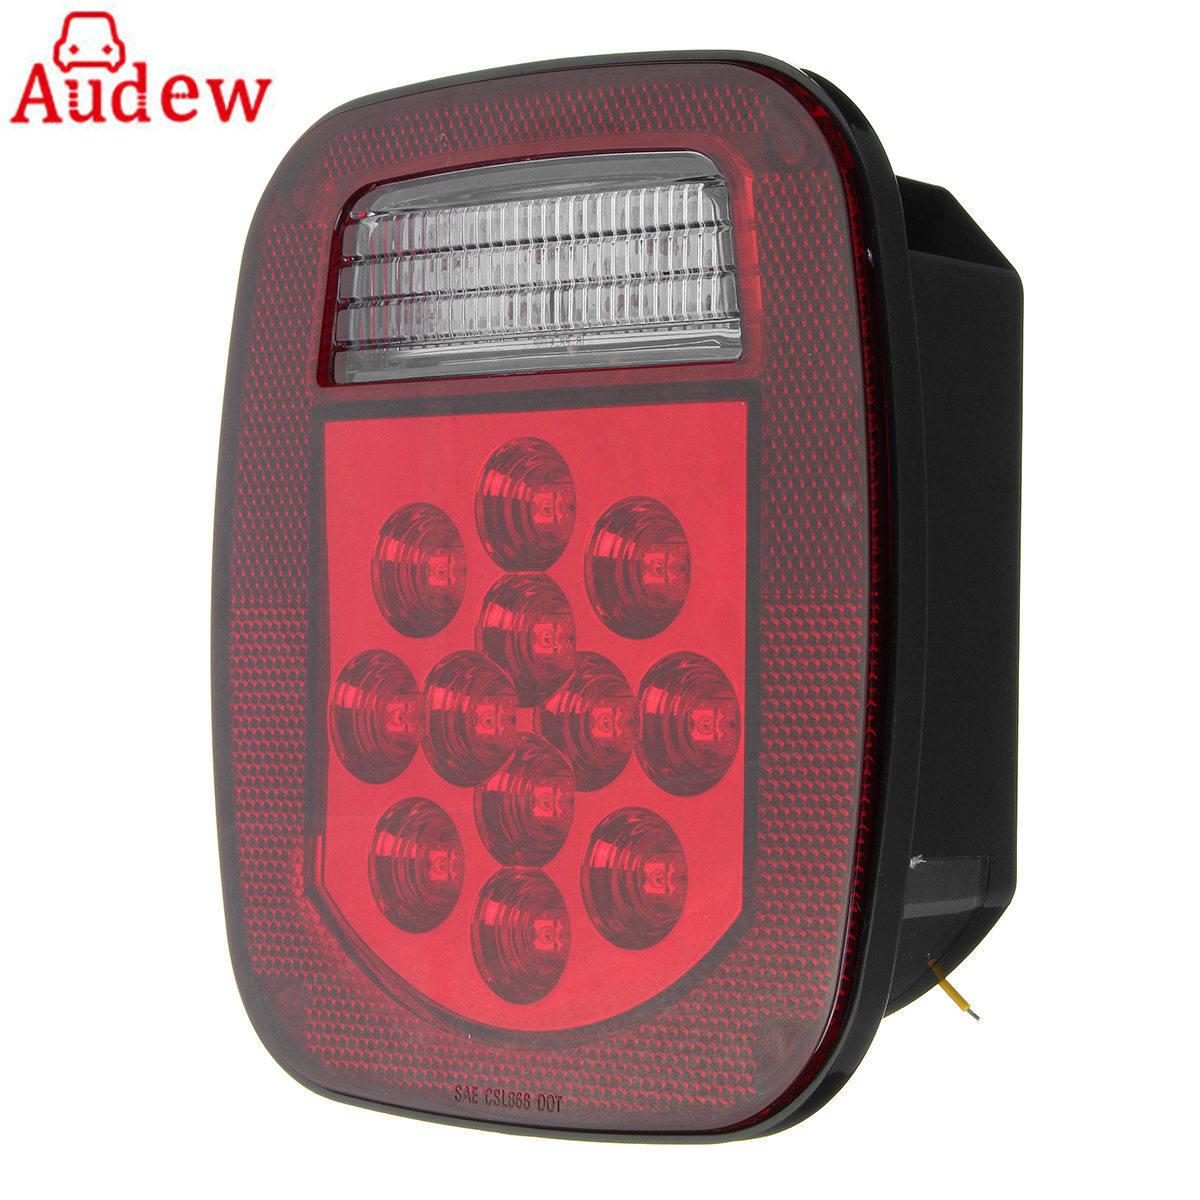 1Pcs 39 LED Car Rear Stop Turn Light Tail Reverse License Light For Truck Trailer Boat